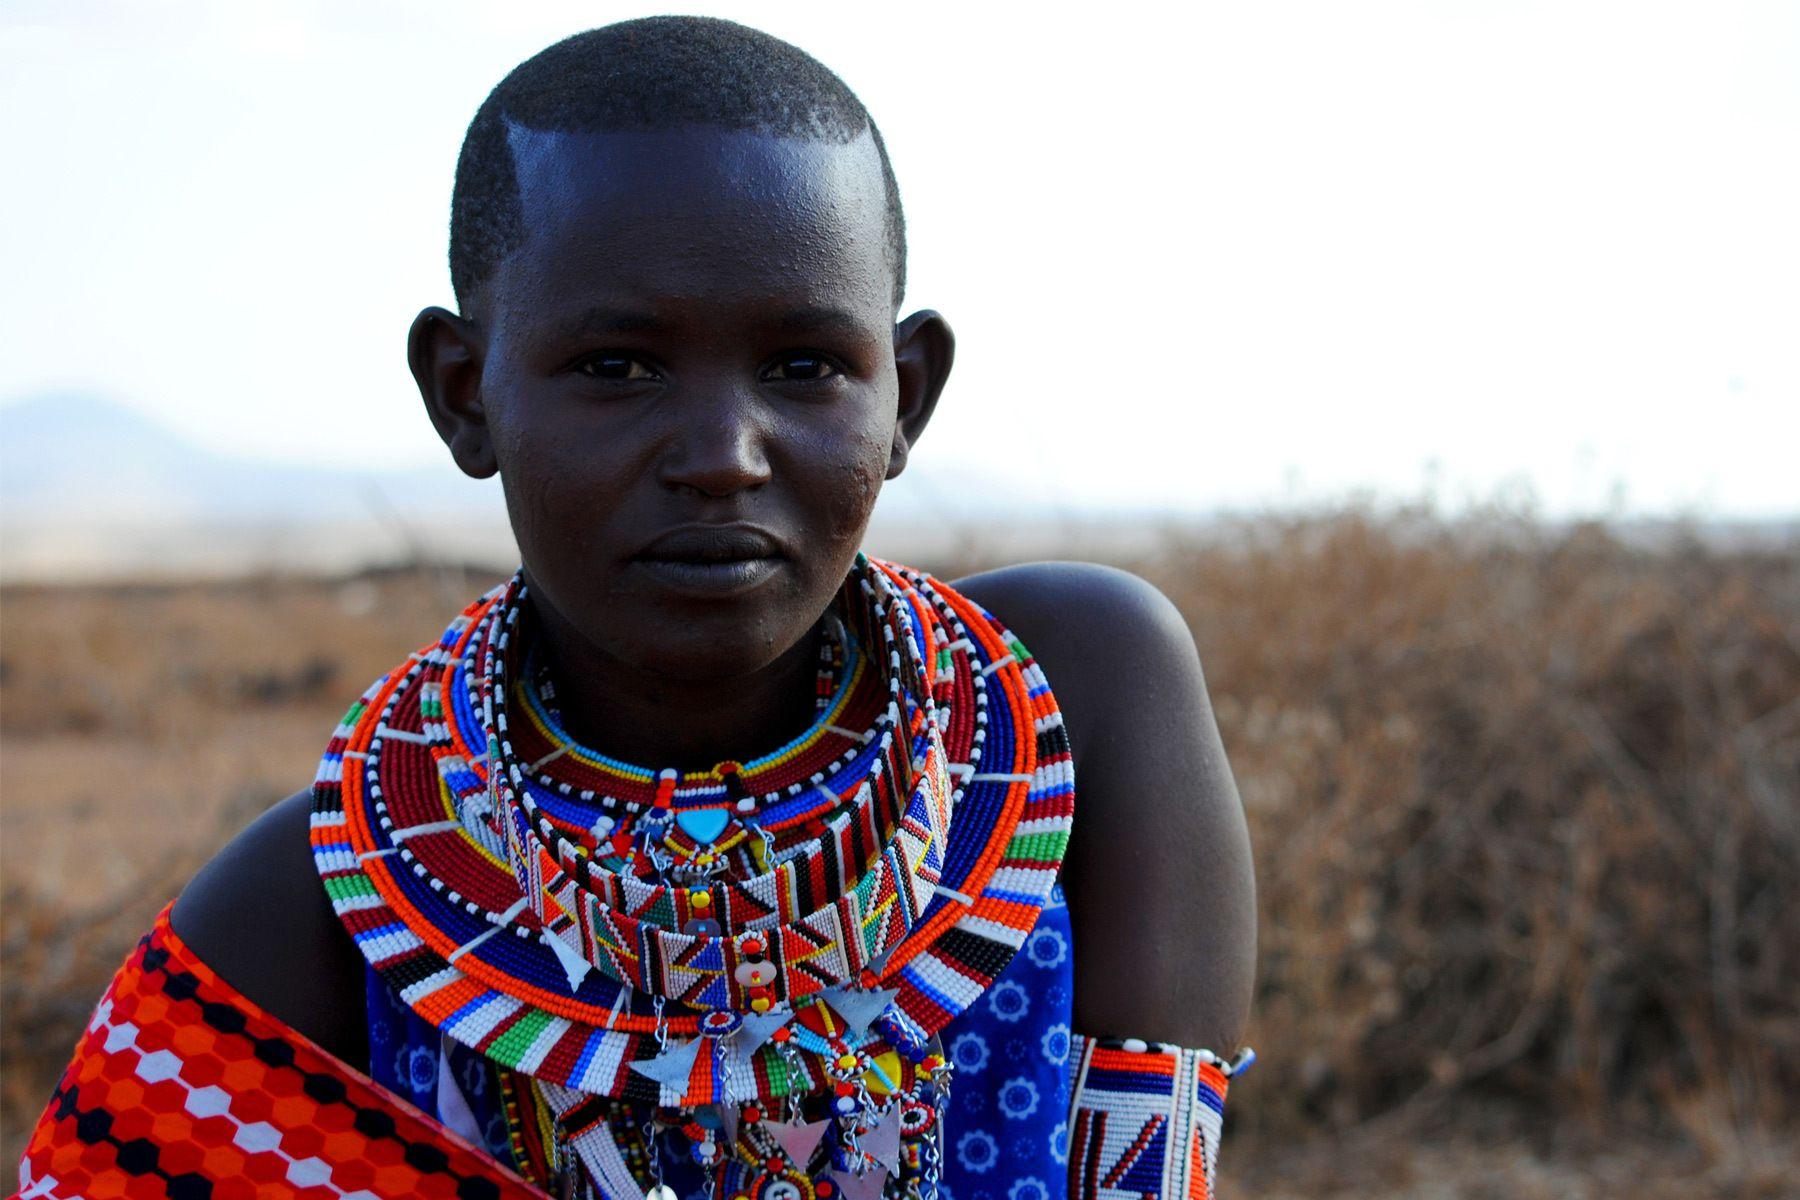 101___africa_kenya_maasai.jpg